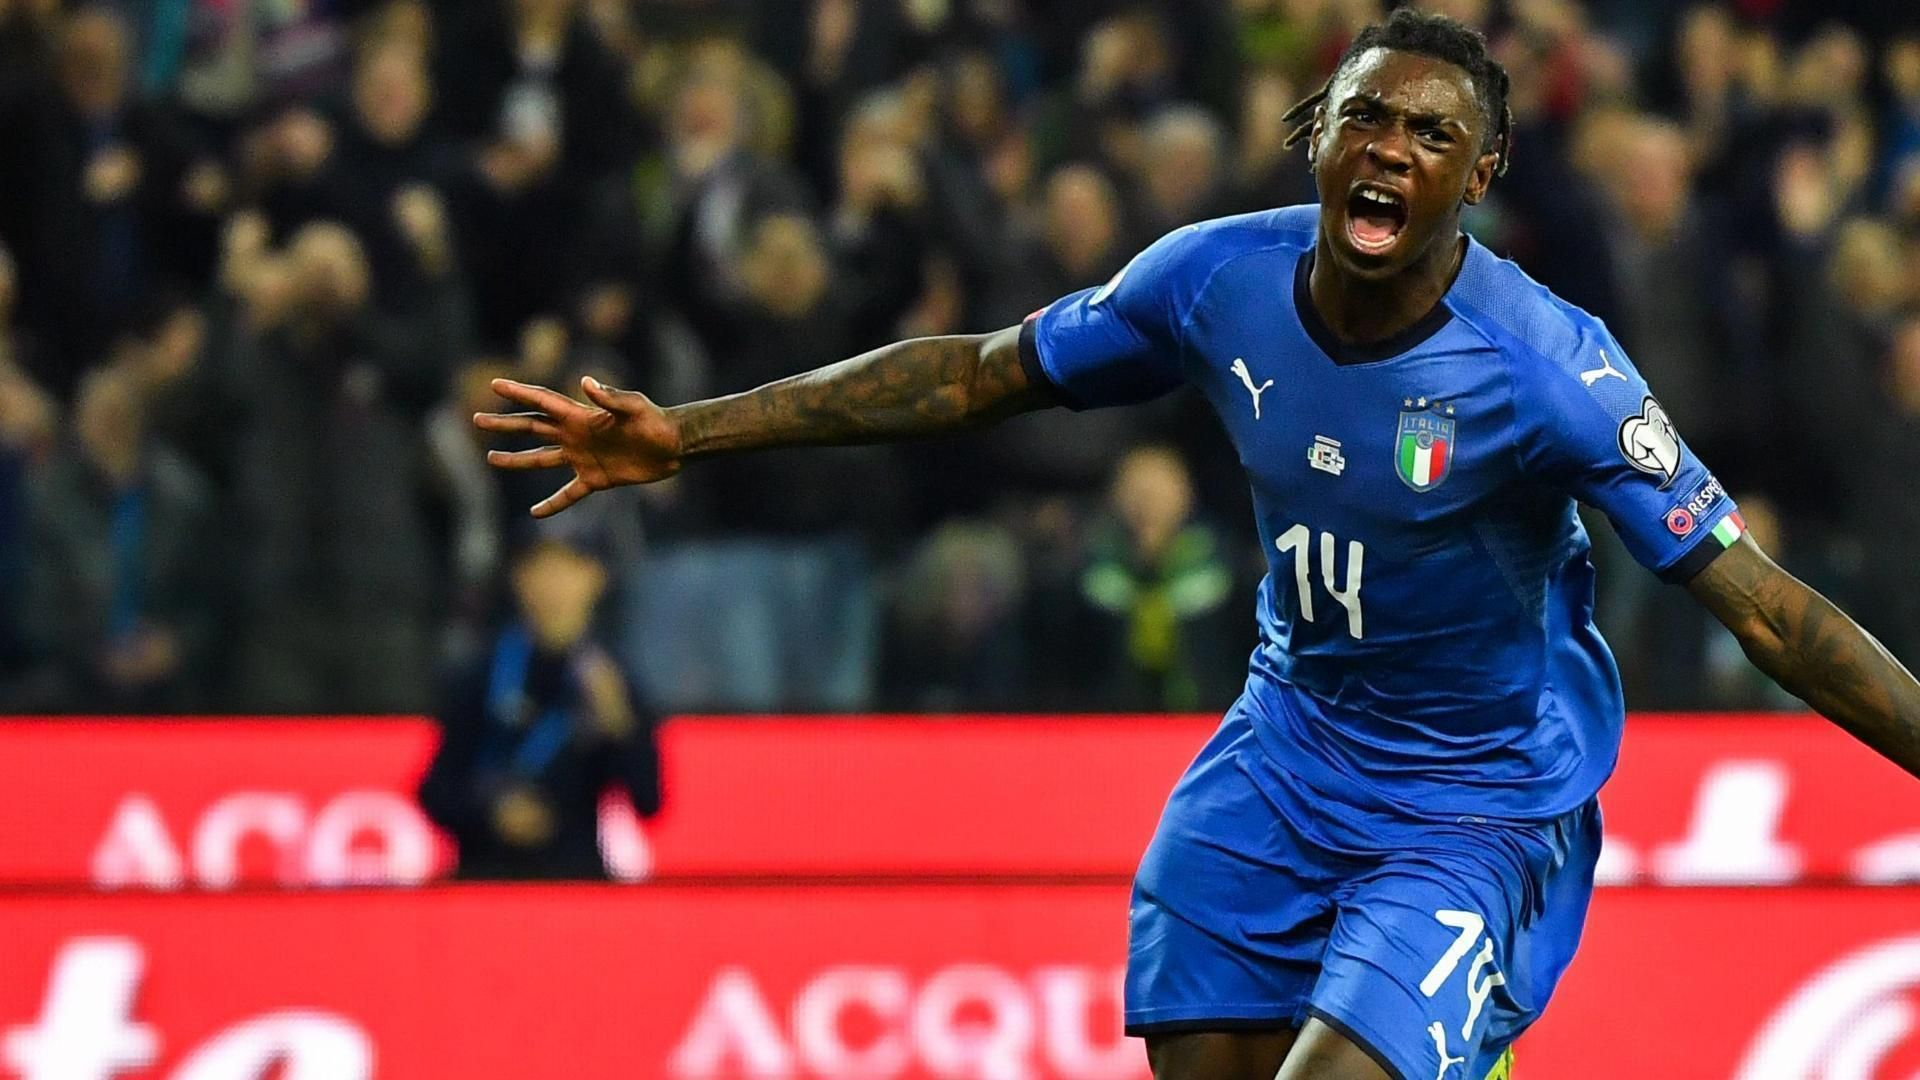 Ronaldo can help me break records - Italy's Juventus forward Kean 3